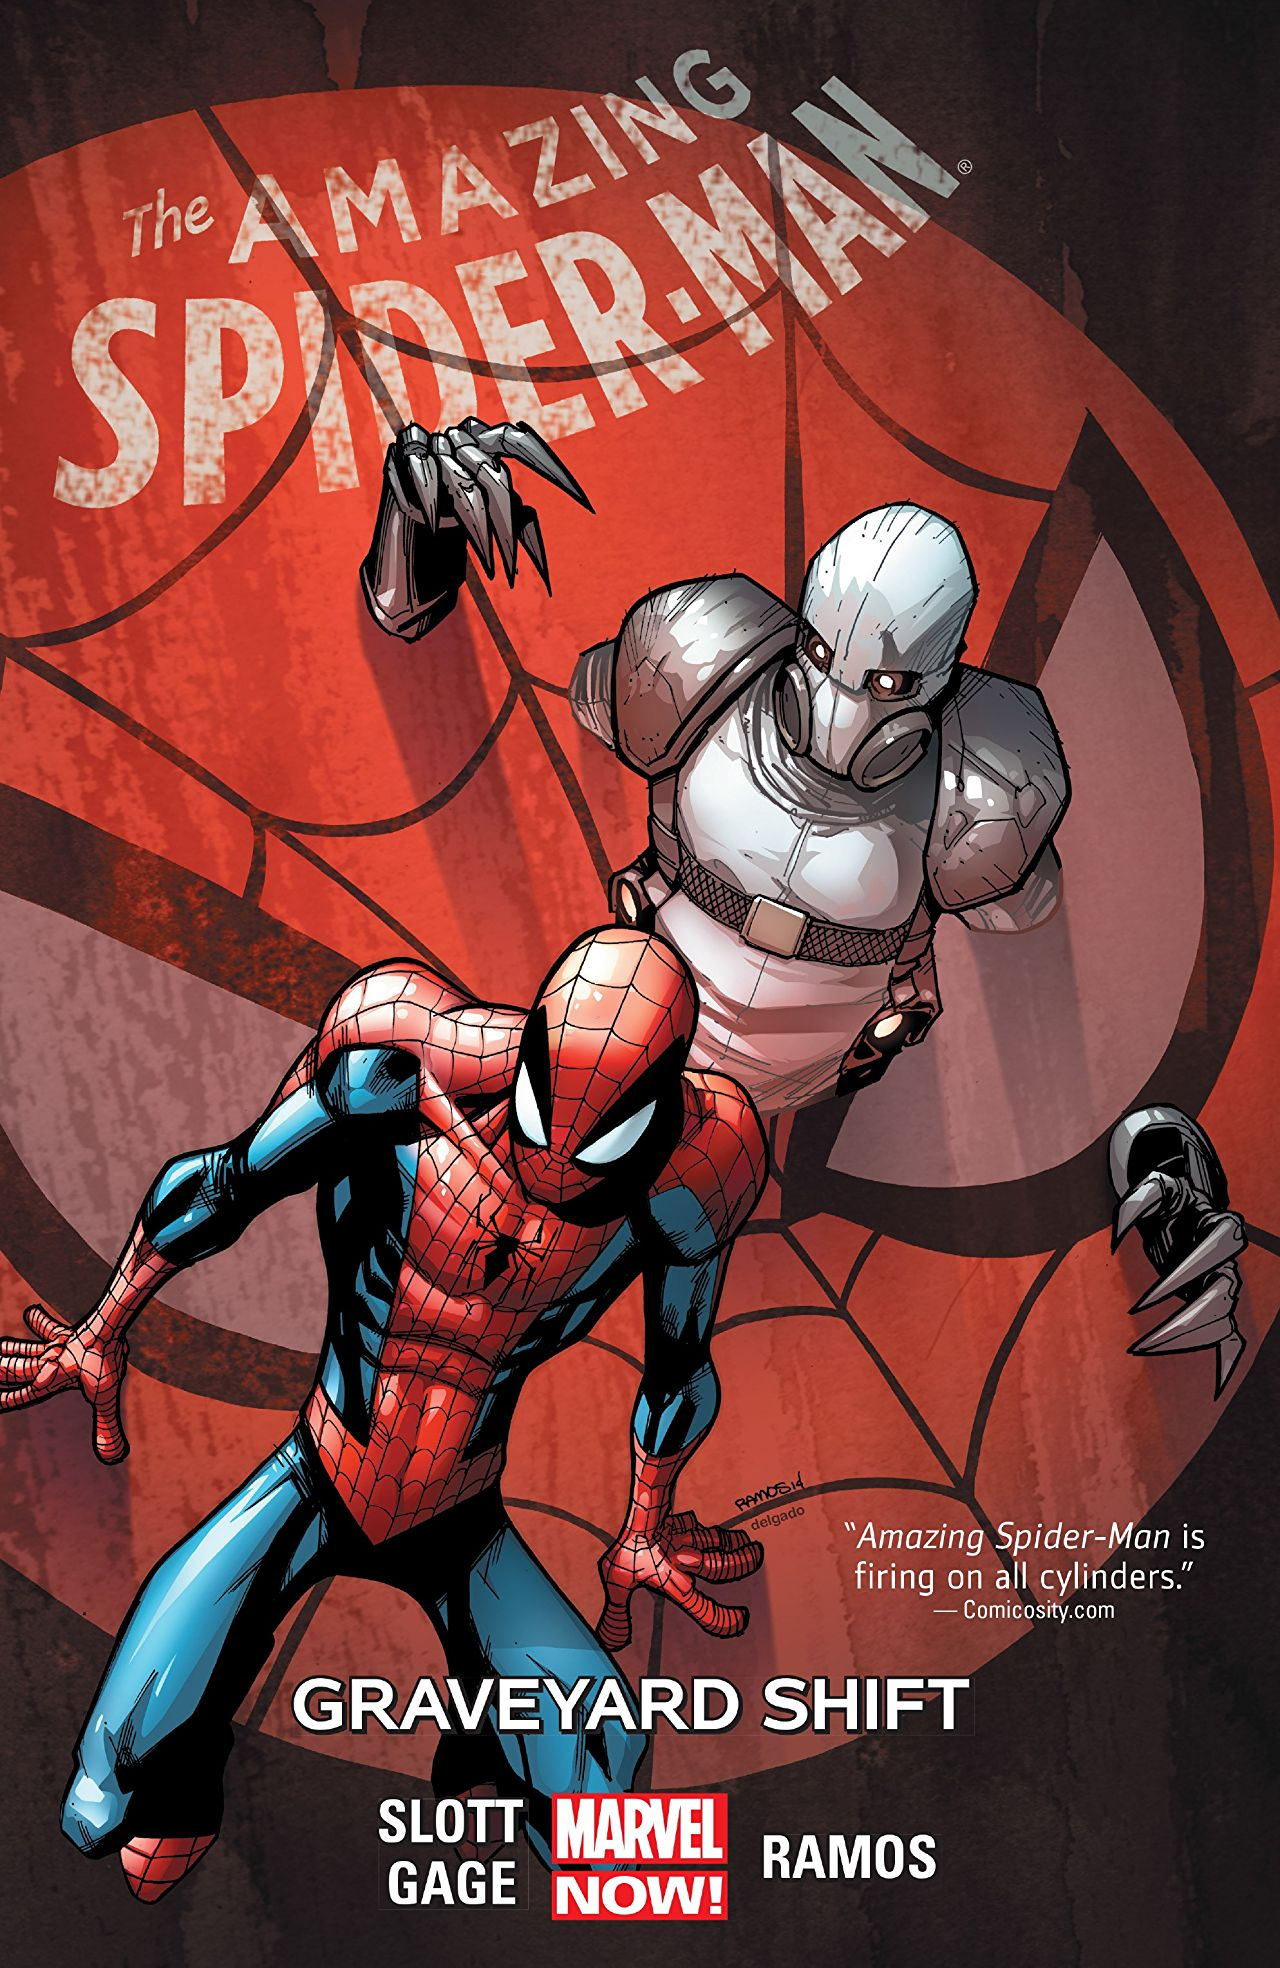 Amazing Spider-Man TPB Vol 2 4: Graveyard Shift